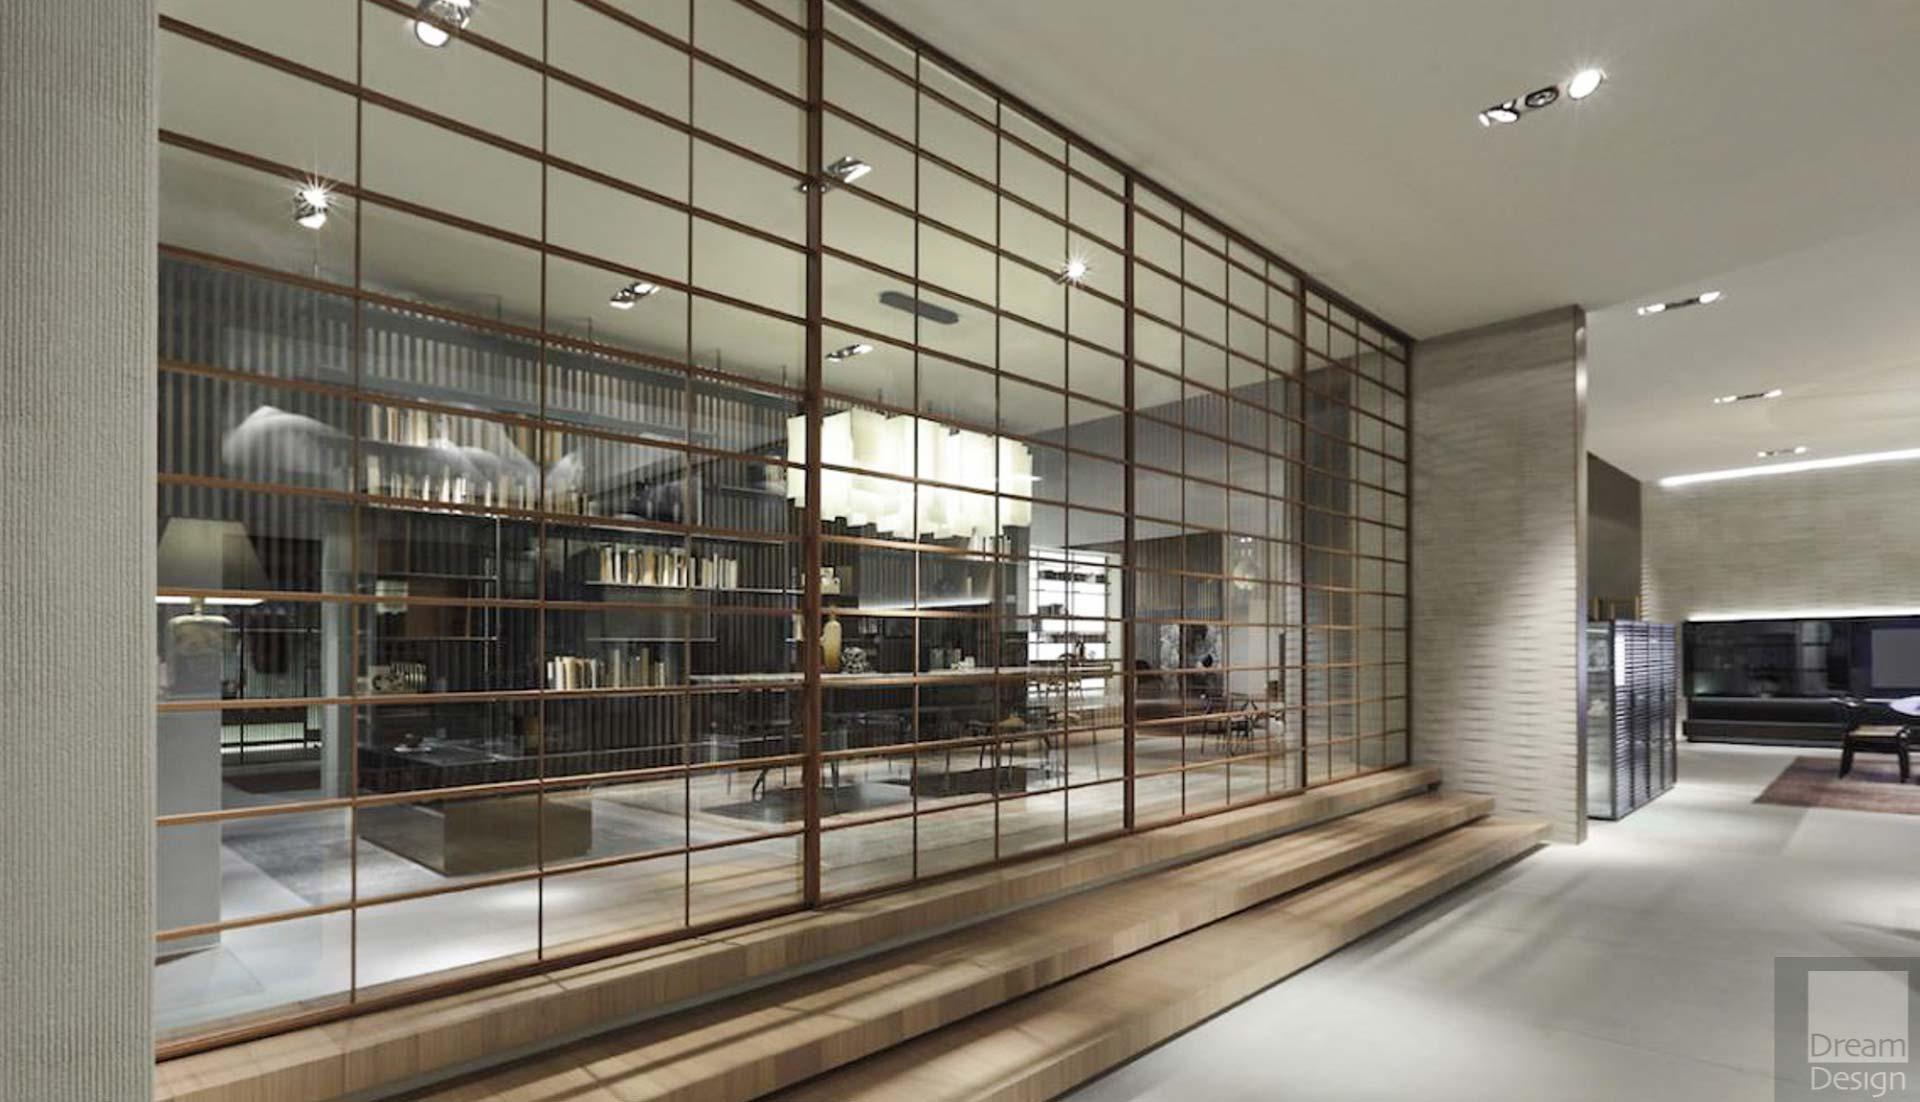 rimadesio soho sliding doors dream design interiors ltd. Black Bedroom Furniture Sets. Home Design Ideas